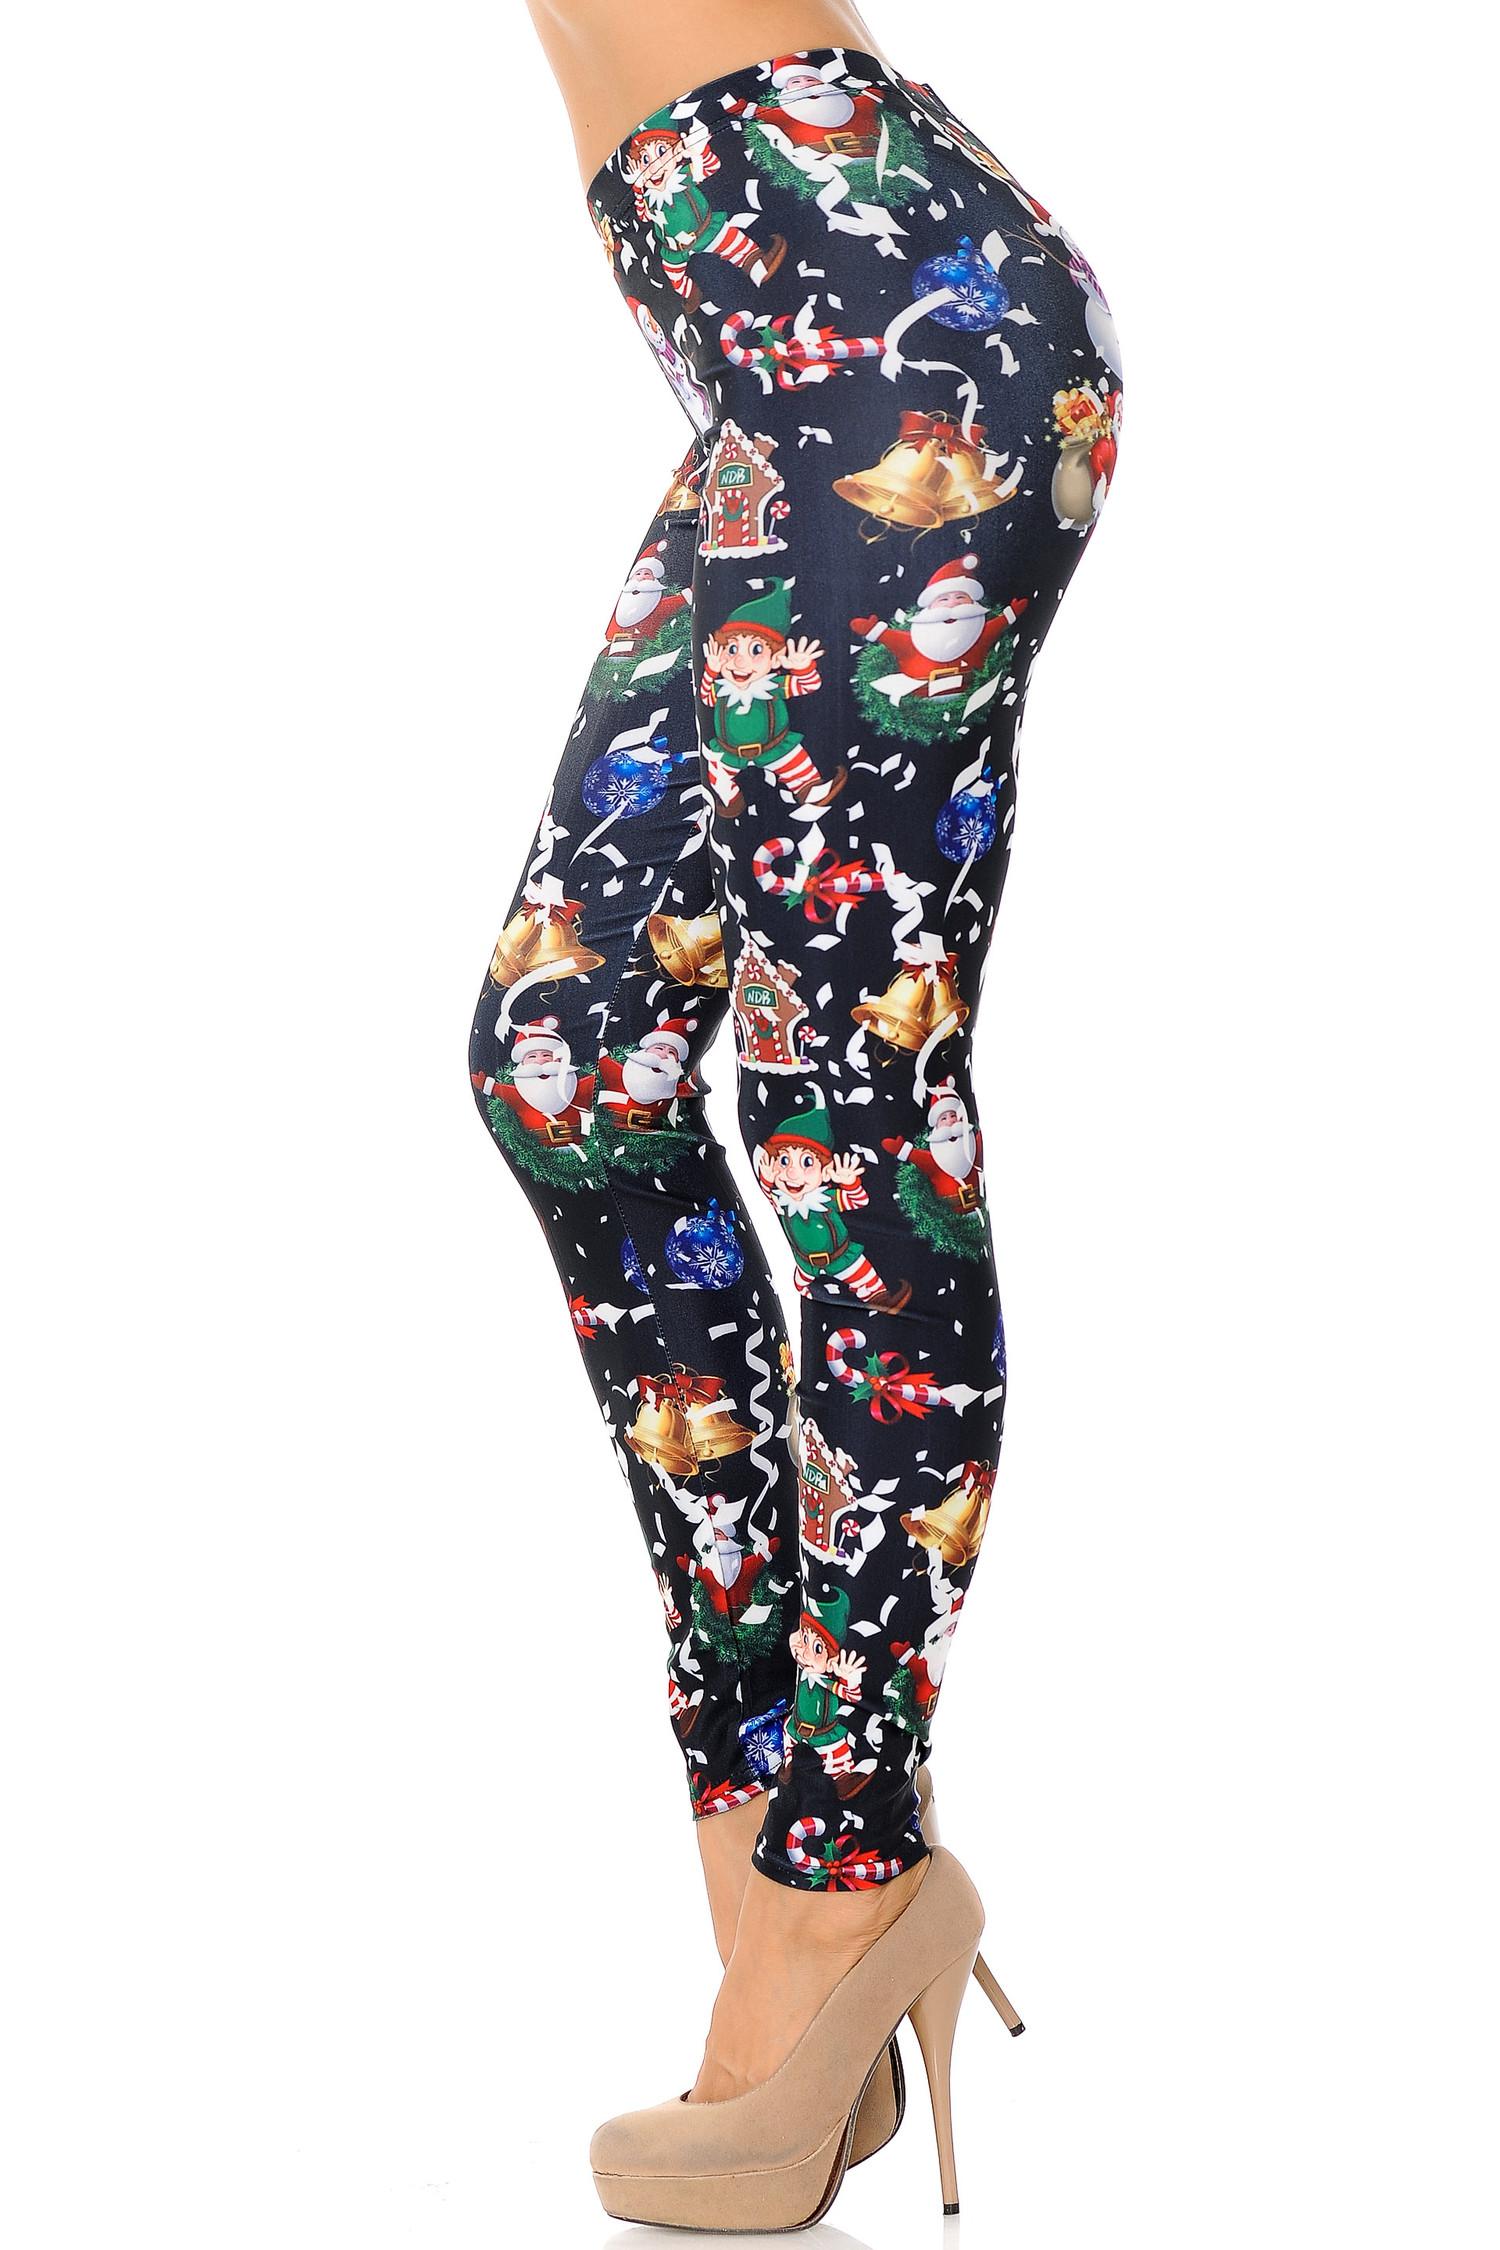 Black Wonderful Festive Christmas Leggings - Plus Size